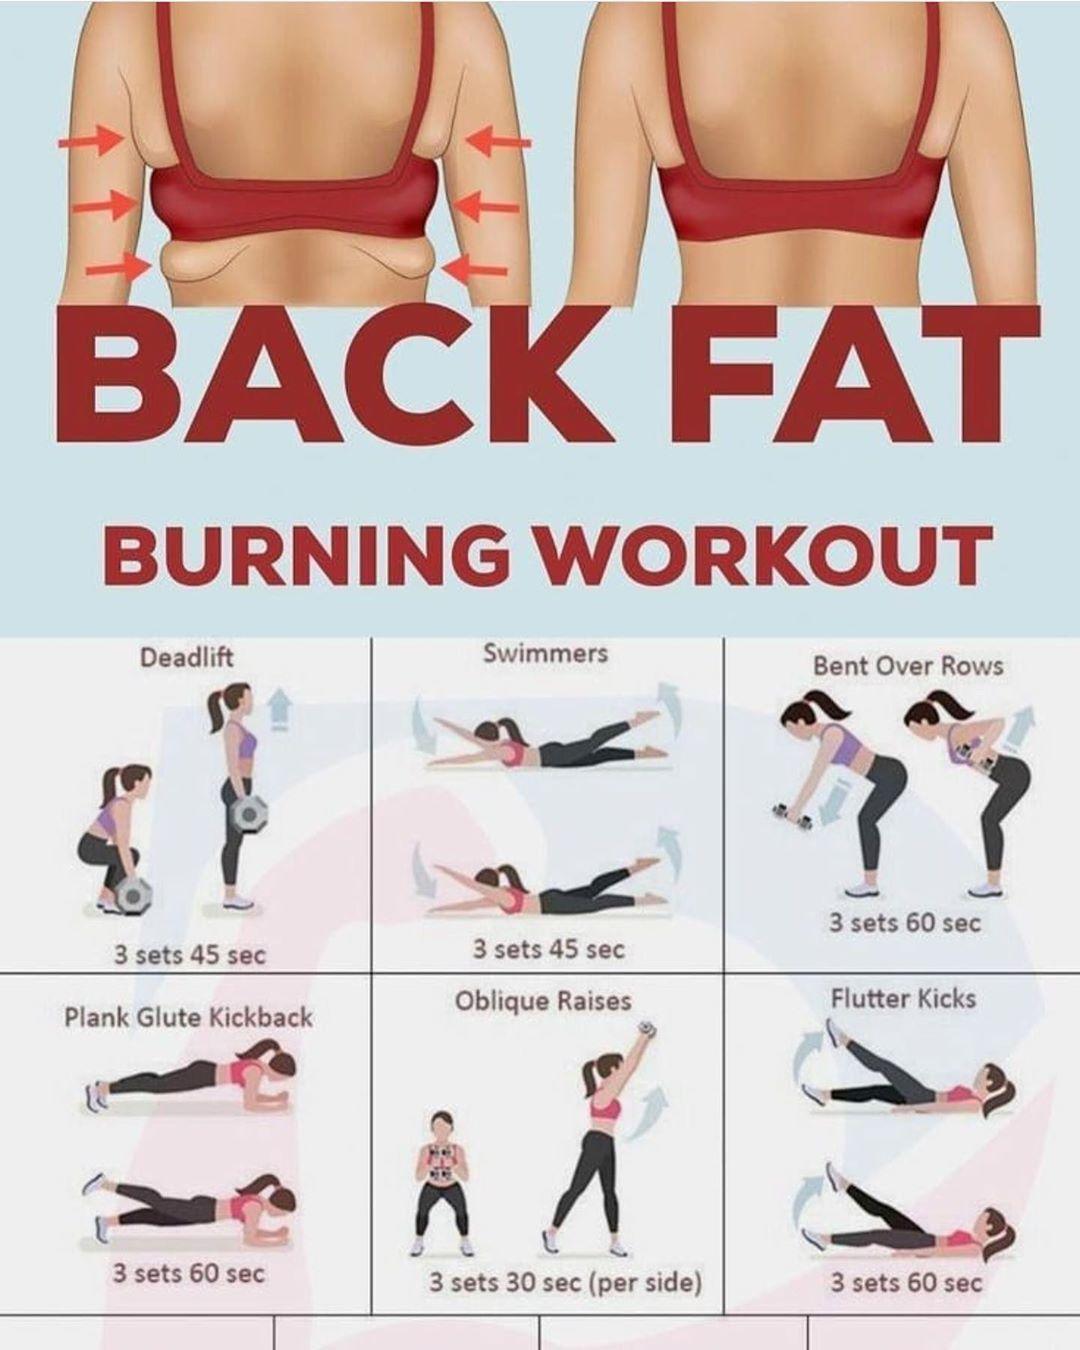 Healthilifestyle On Instagram من ابشع الدهون الي تخرب شكل الجسم دهون الظهر بس الحل سهل و Workout For Flat Stomach Stomach Workout Glute Kickbacks